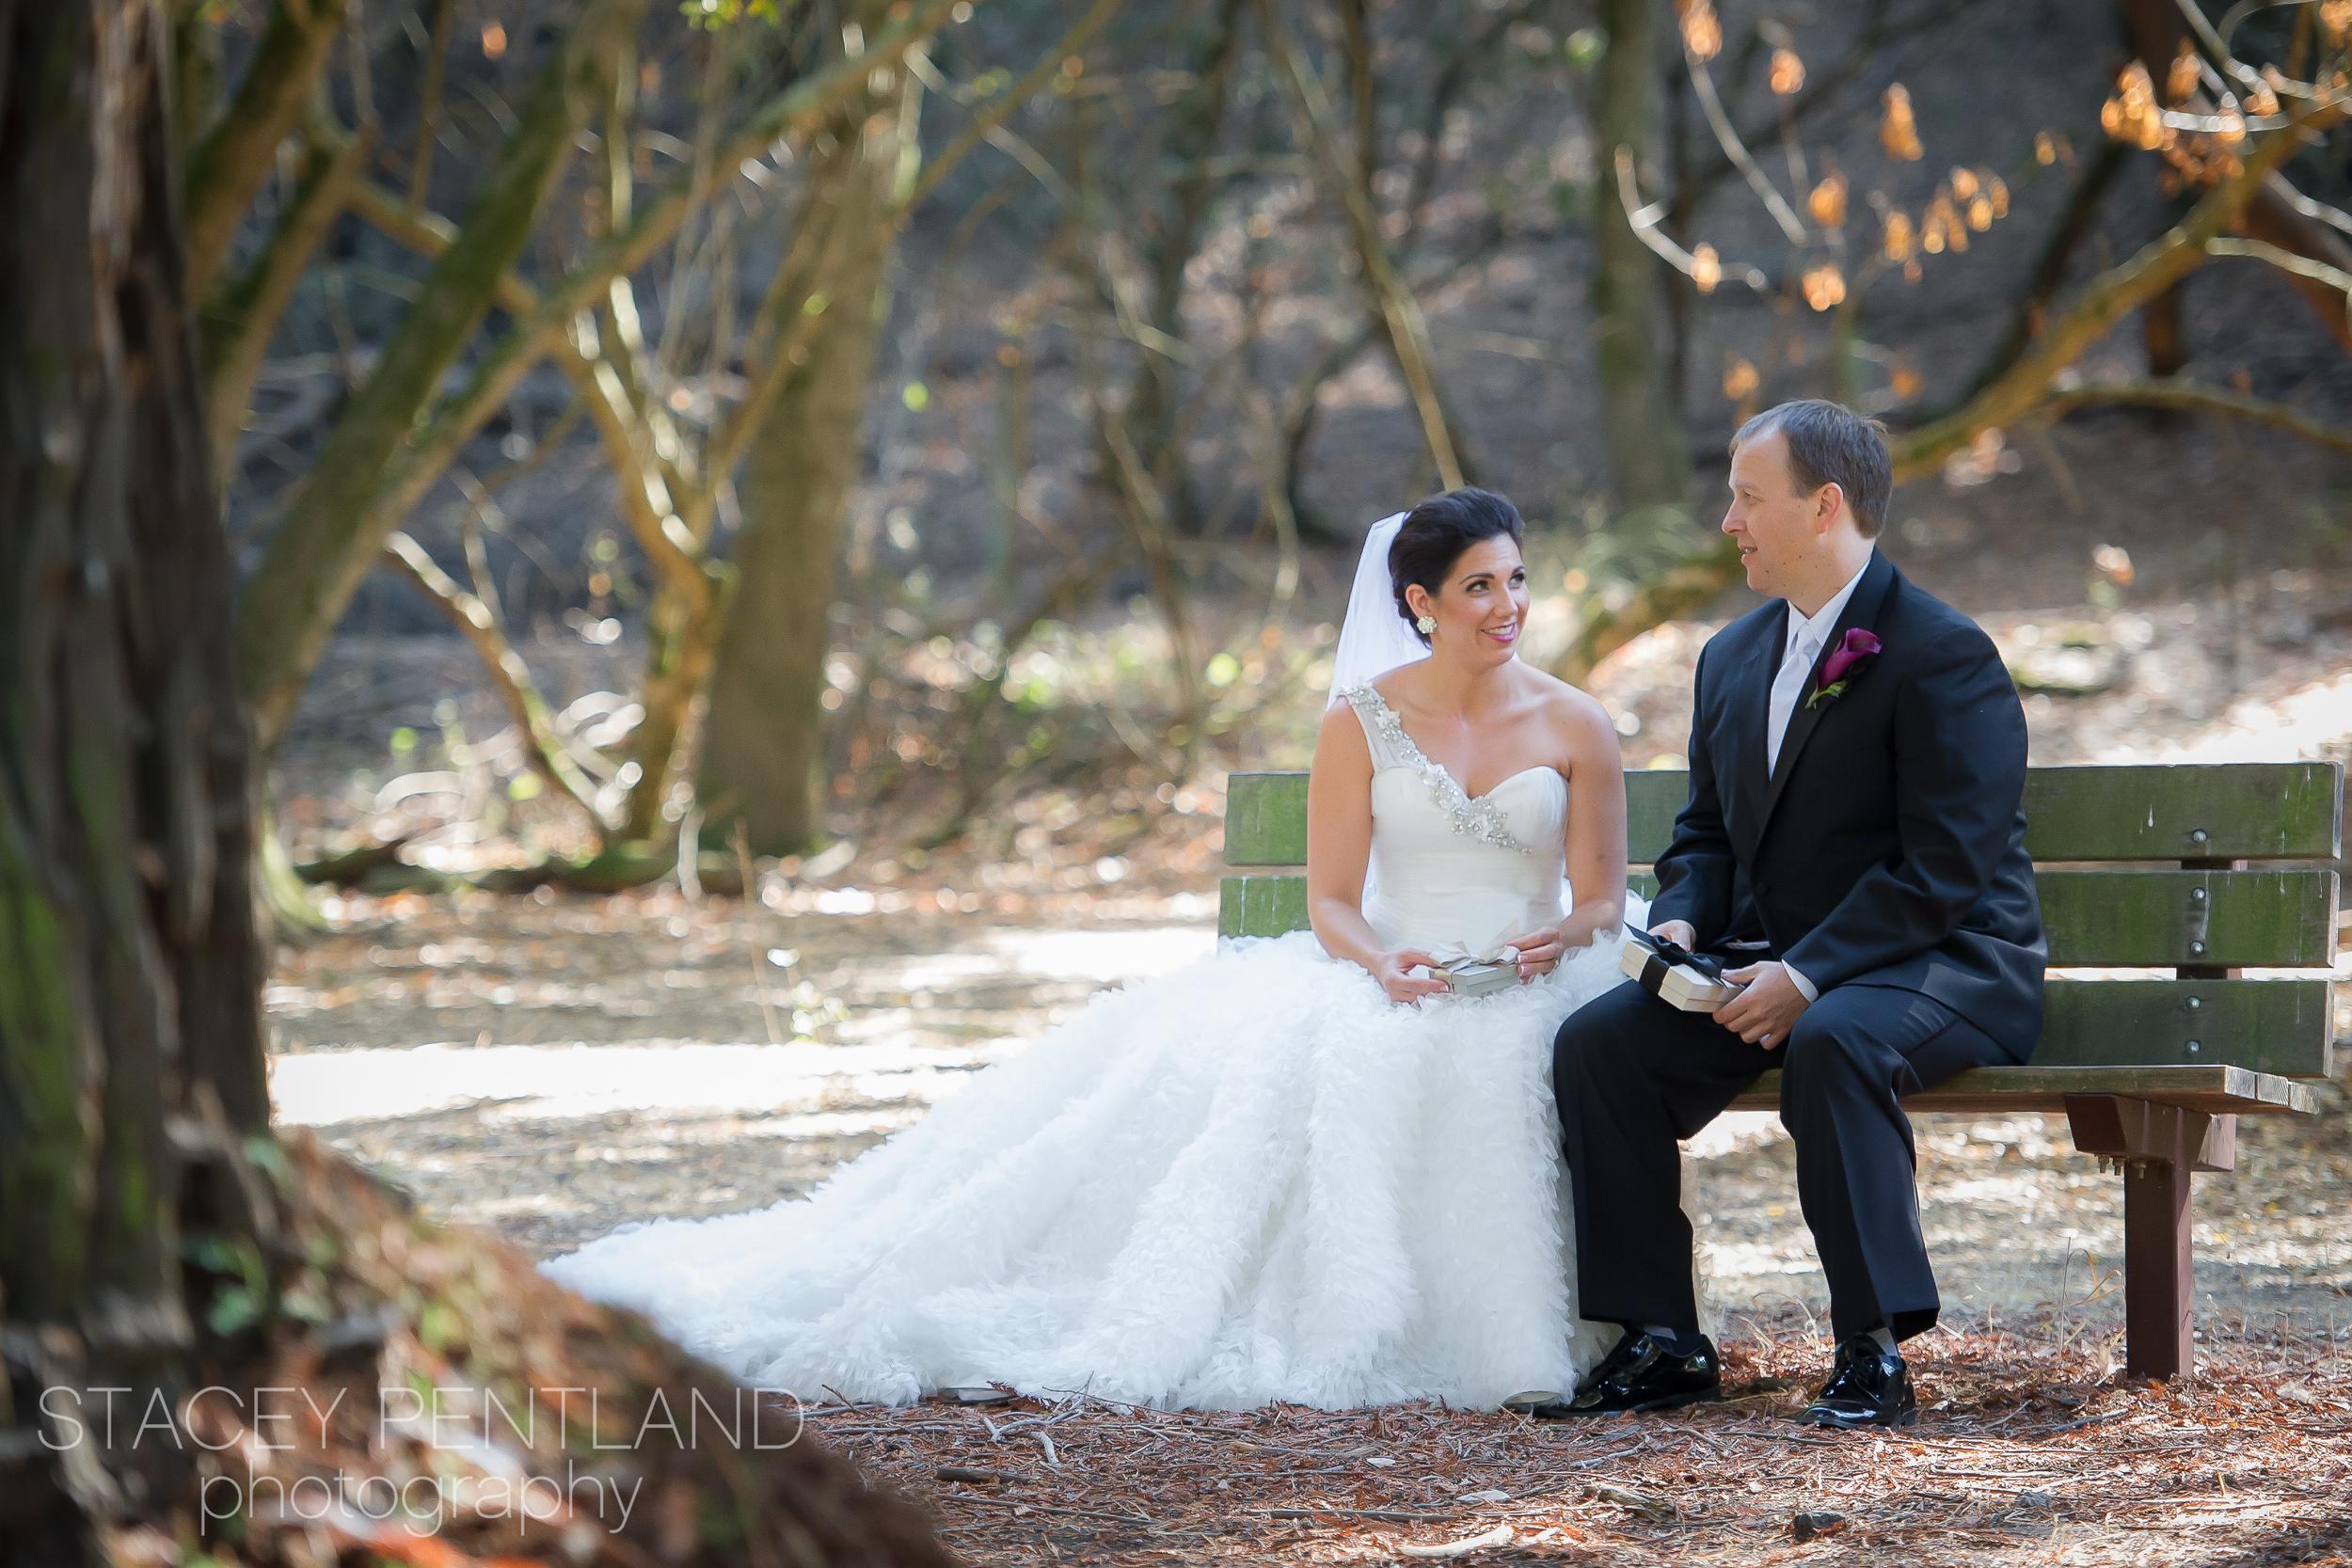 julie+michael_wedding_spp_001.jpg